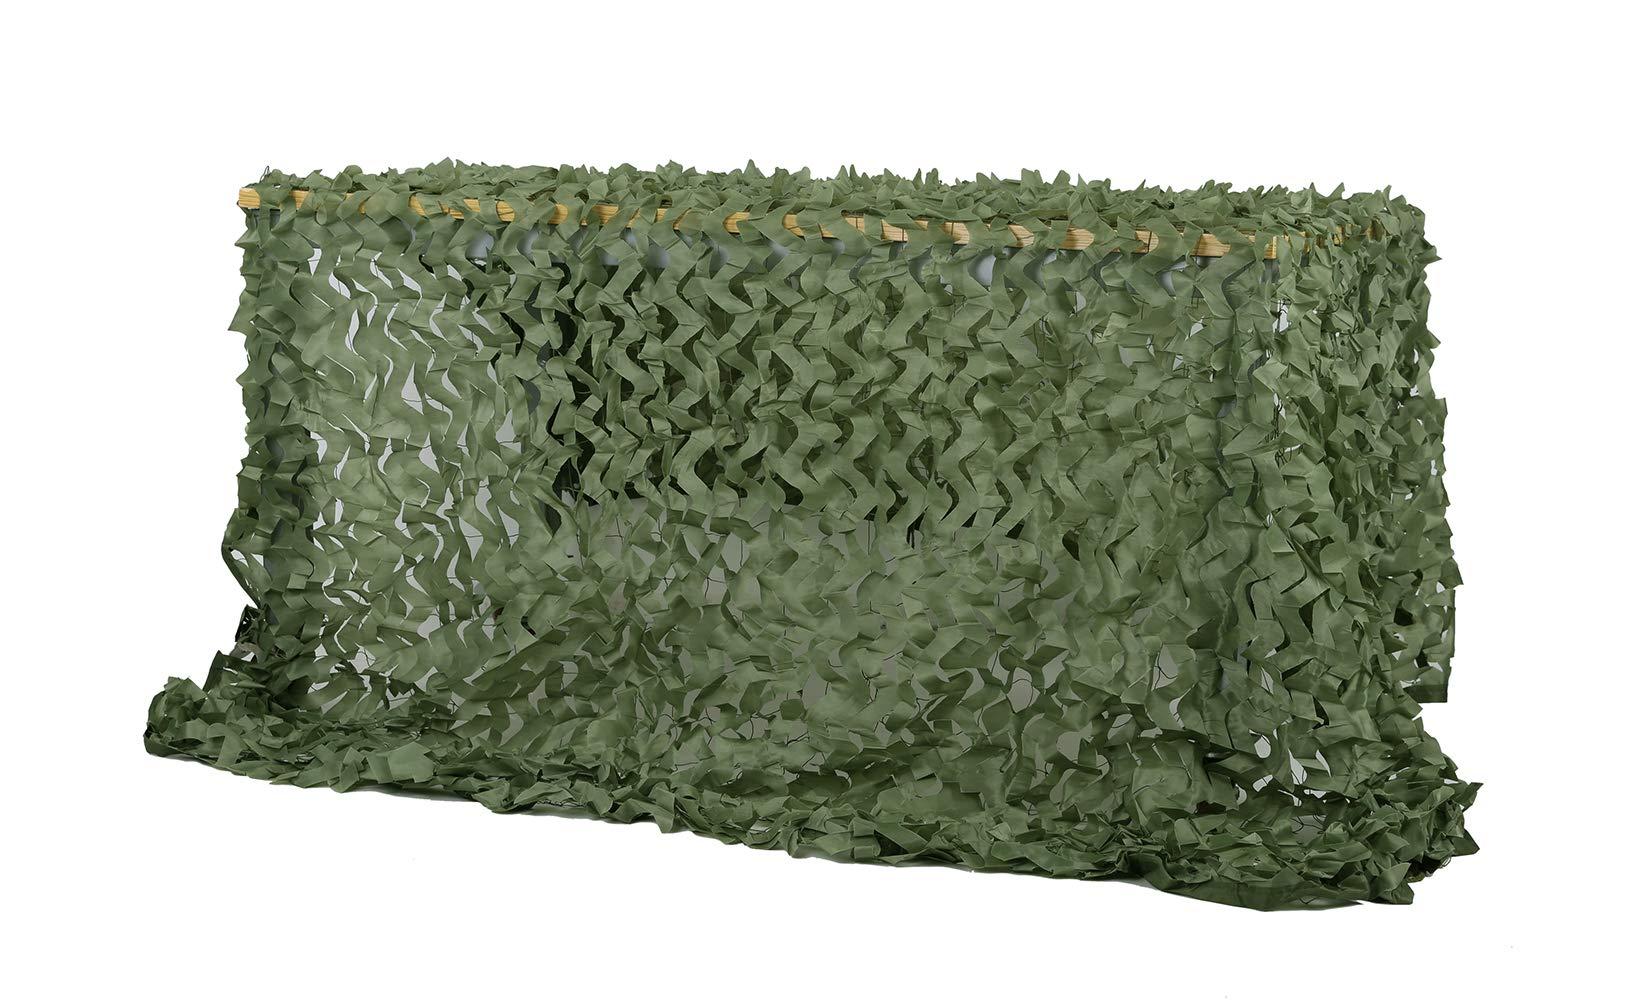 Chiglia Camouflage Netting Camo Net Sunscreen Nets Green 6.5ftx10ft